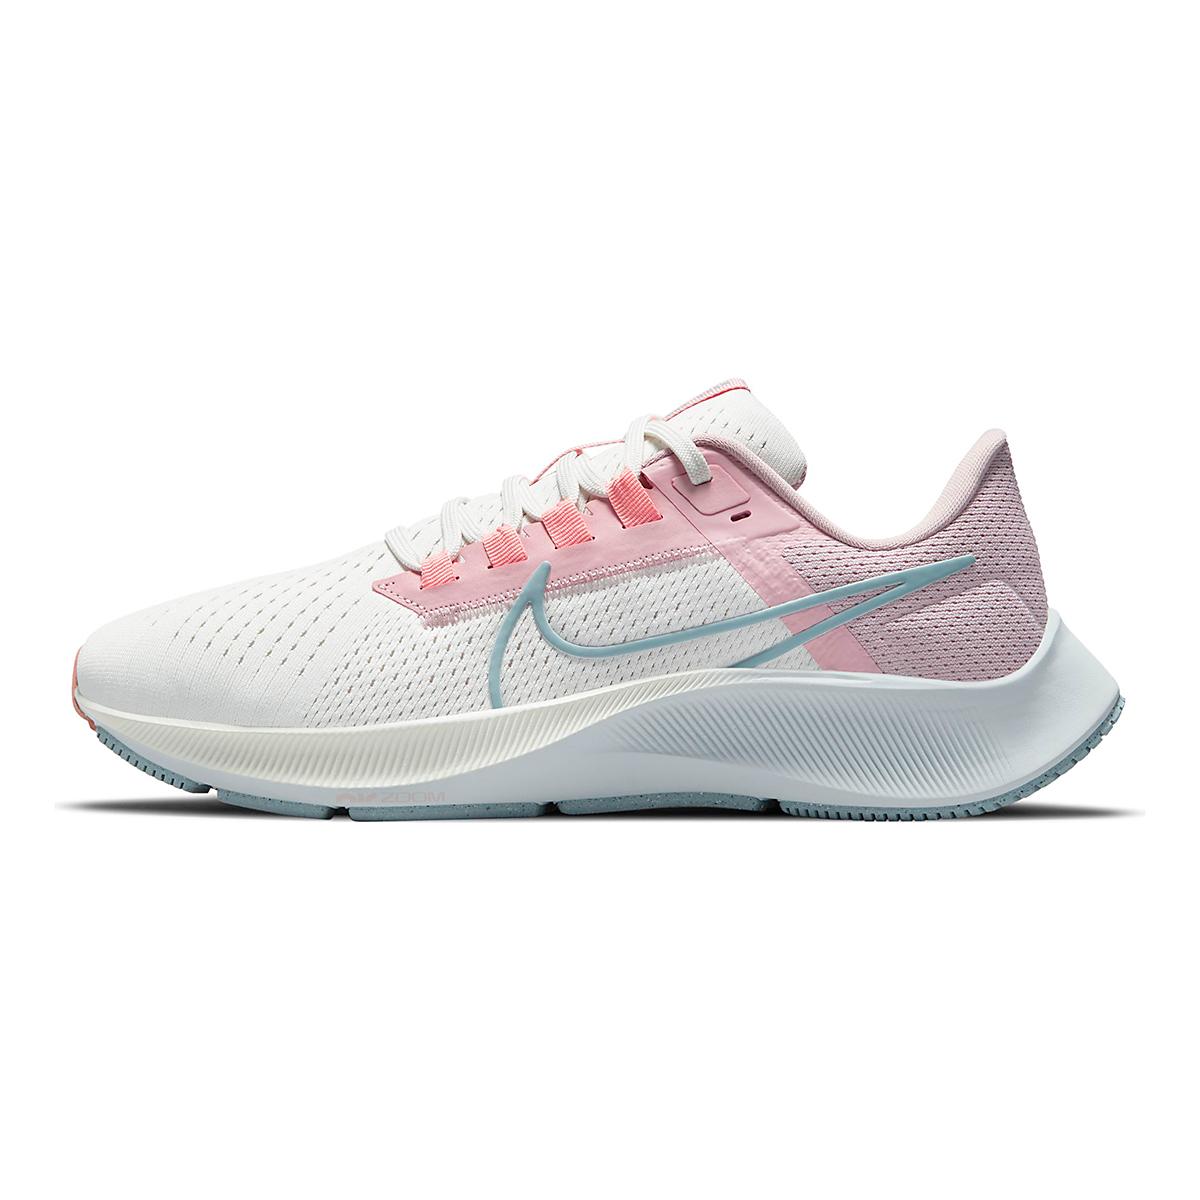 Women's Nike Air Zoom Pegasus 38 Running Shoe - Color: Sail/Ocean Cube/Pink Glaze/Crimson Bliss - Size: 5 - Width: Regular, Sail/Ocean Cube/Pink Glaze/Crimson Bliss, large, image 2